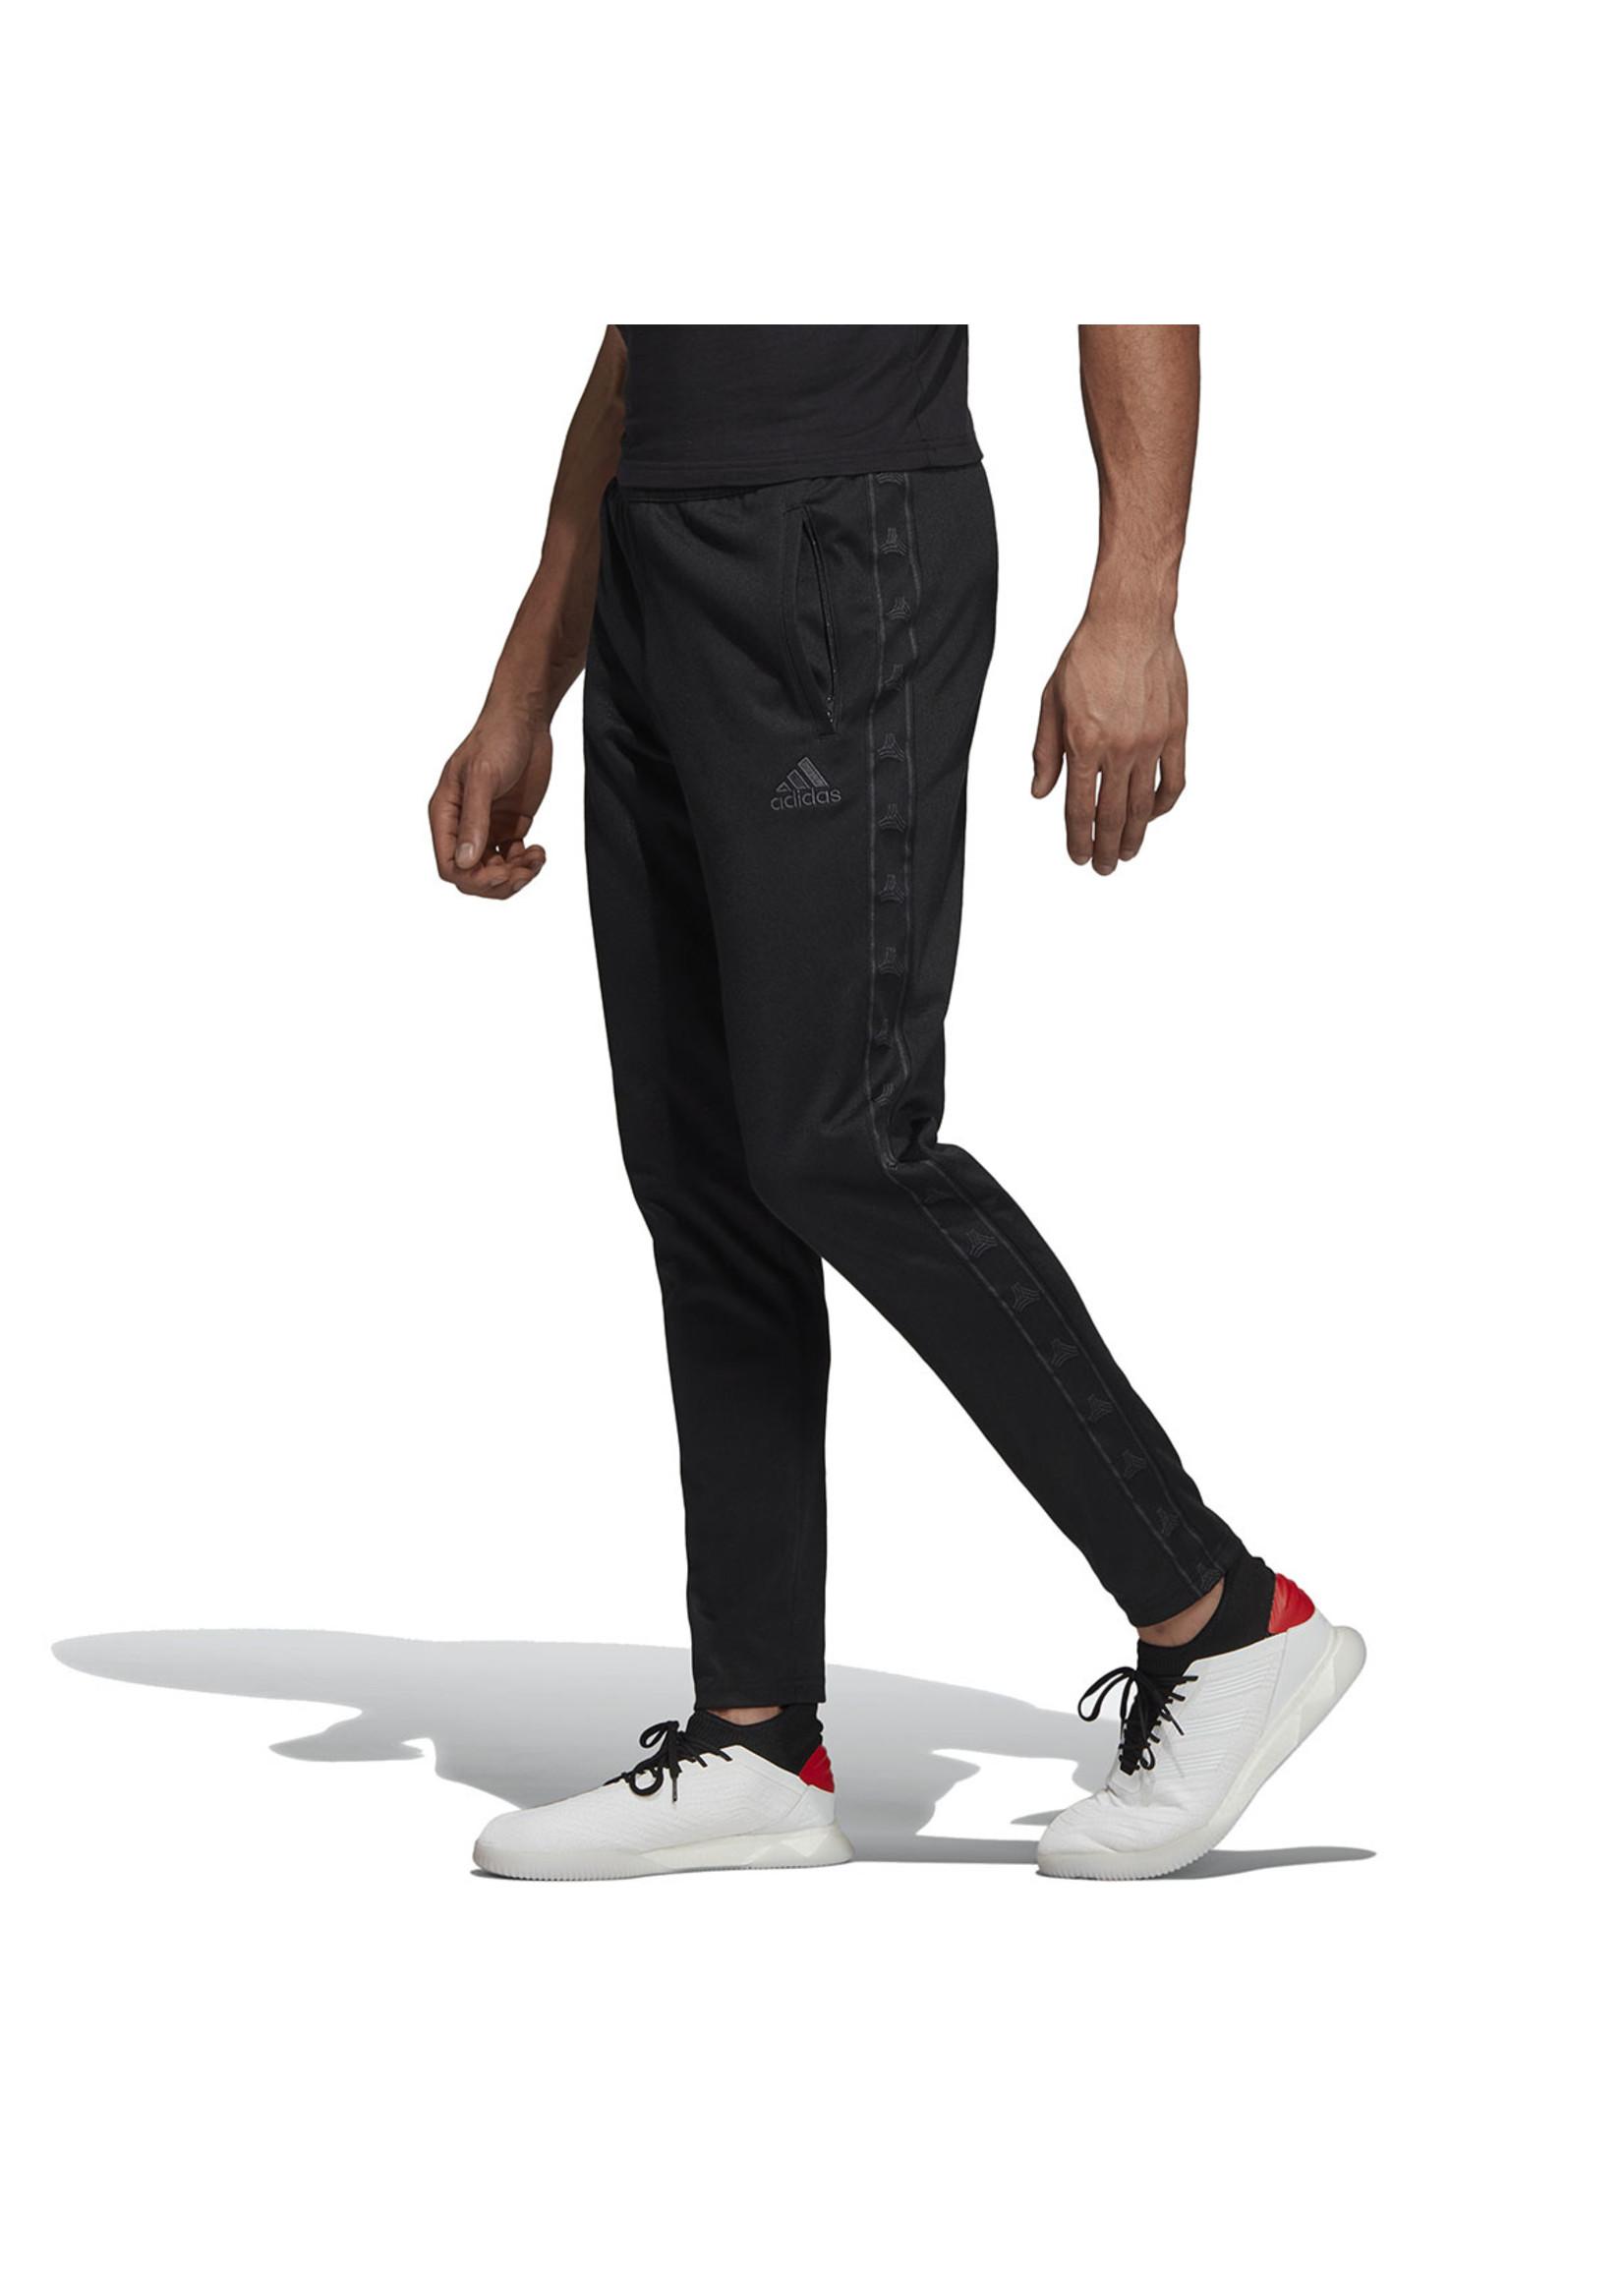 Adidas Tango Track Pants - Blackout